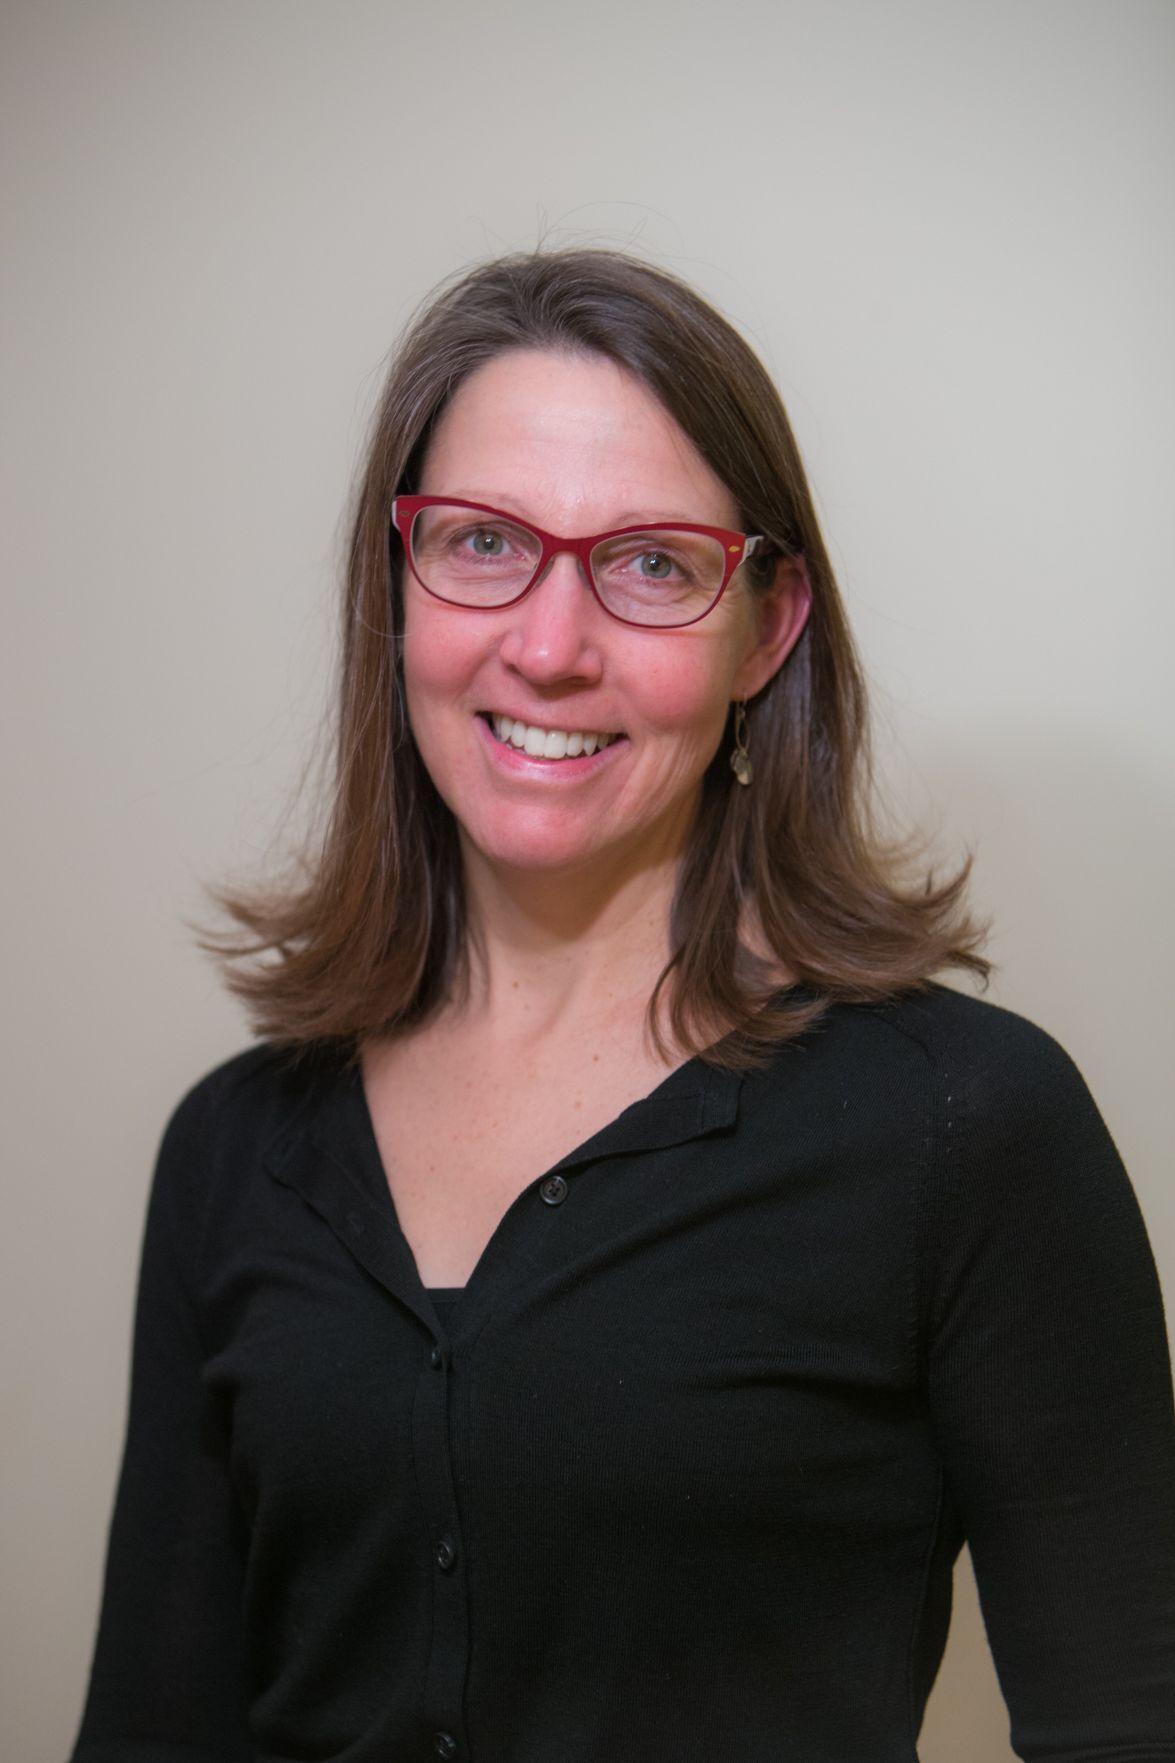 Becky Kasten